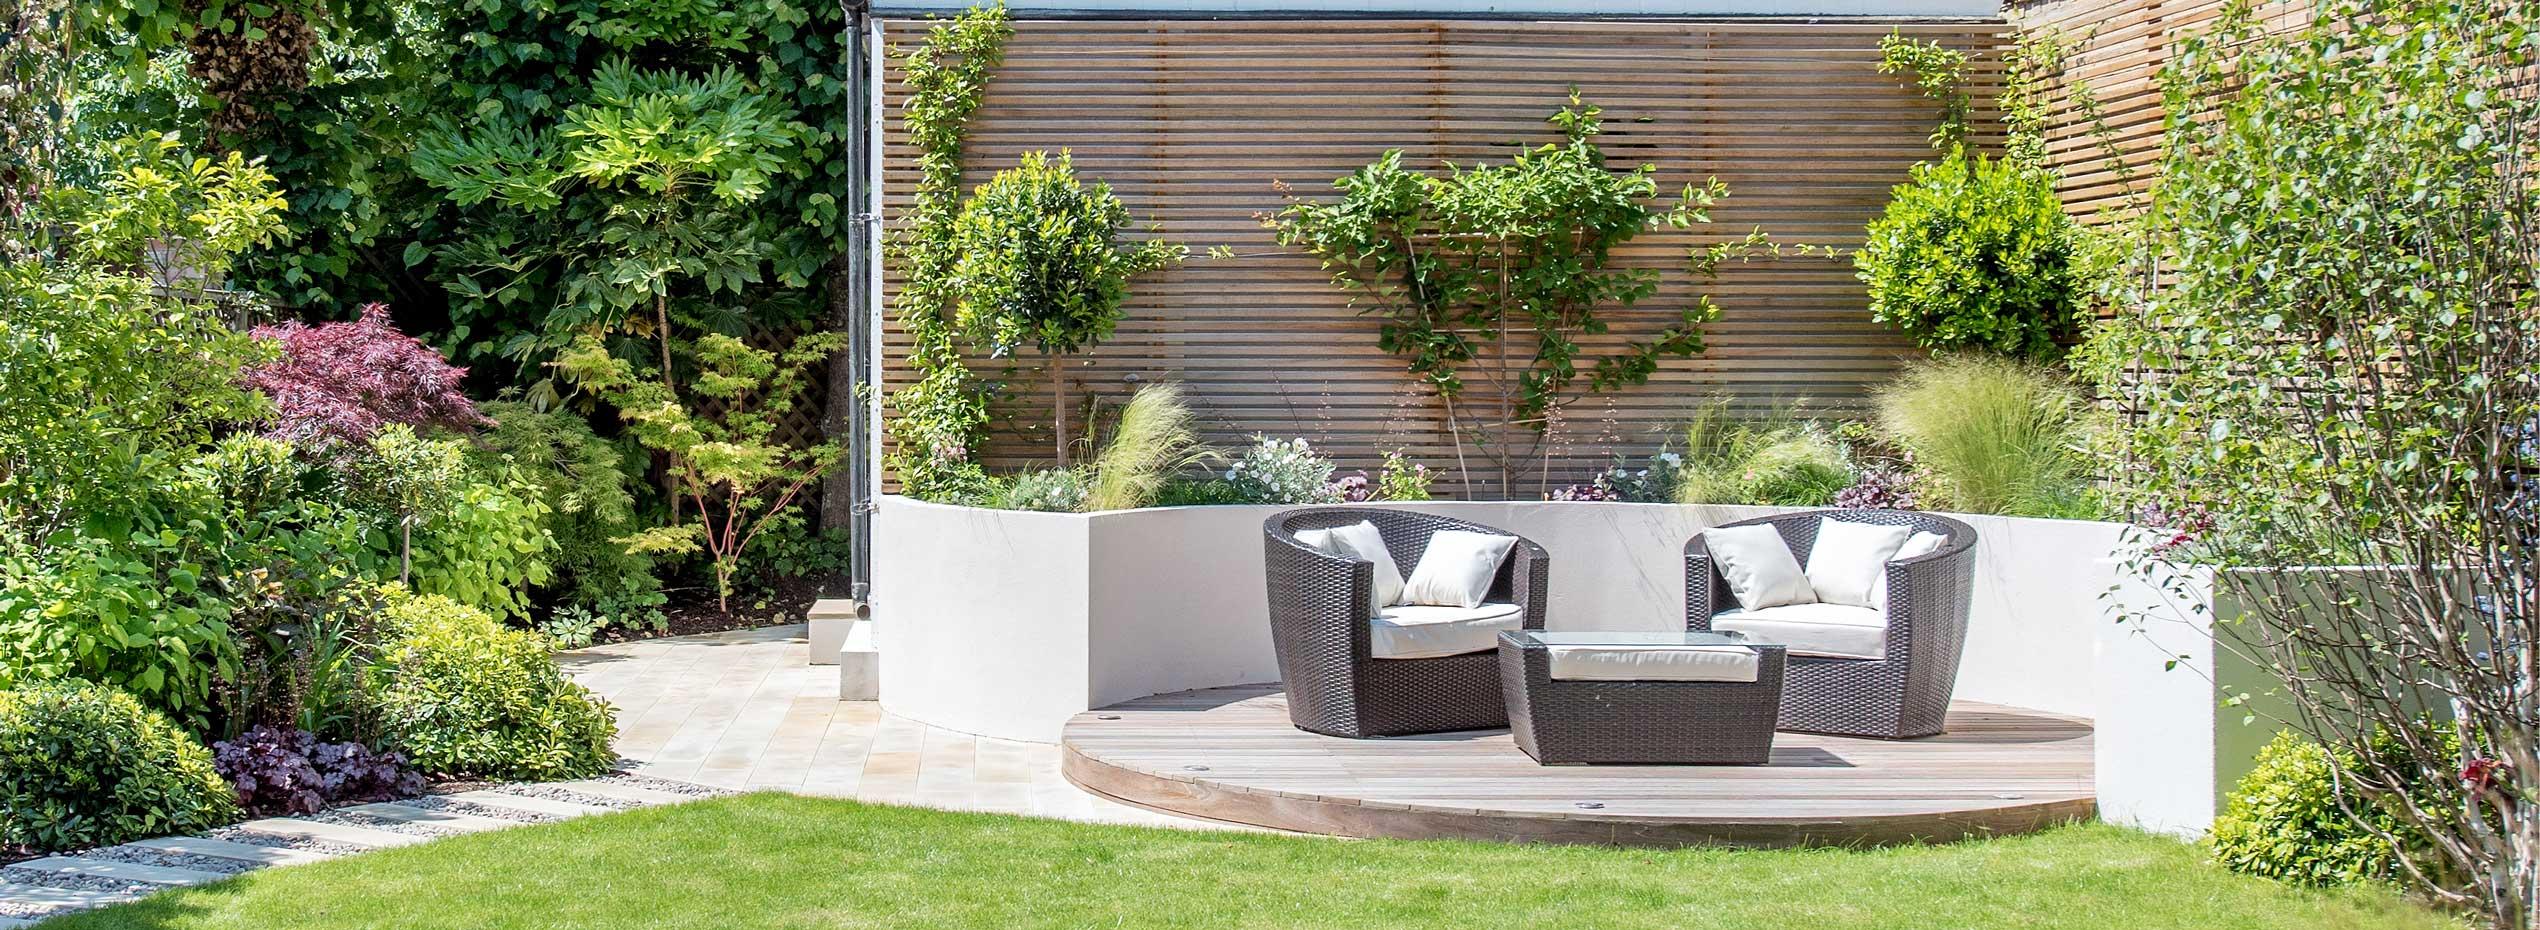 Garden Design Uk kate eyre landscape & garden design london